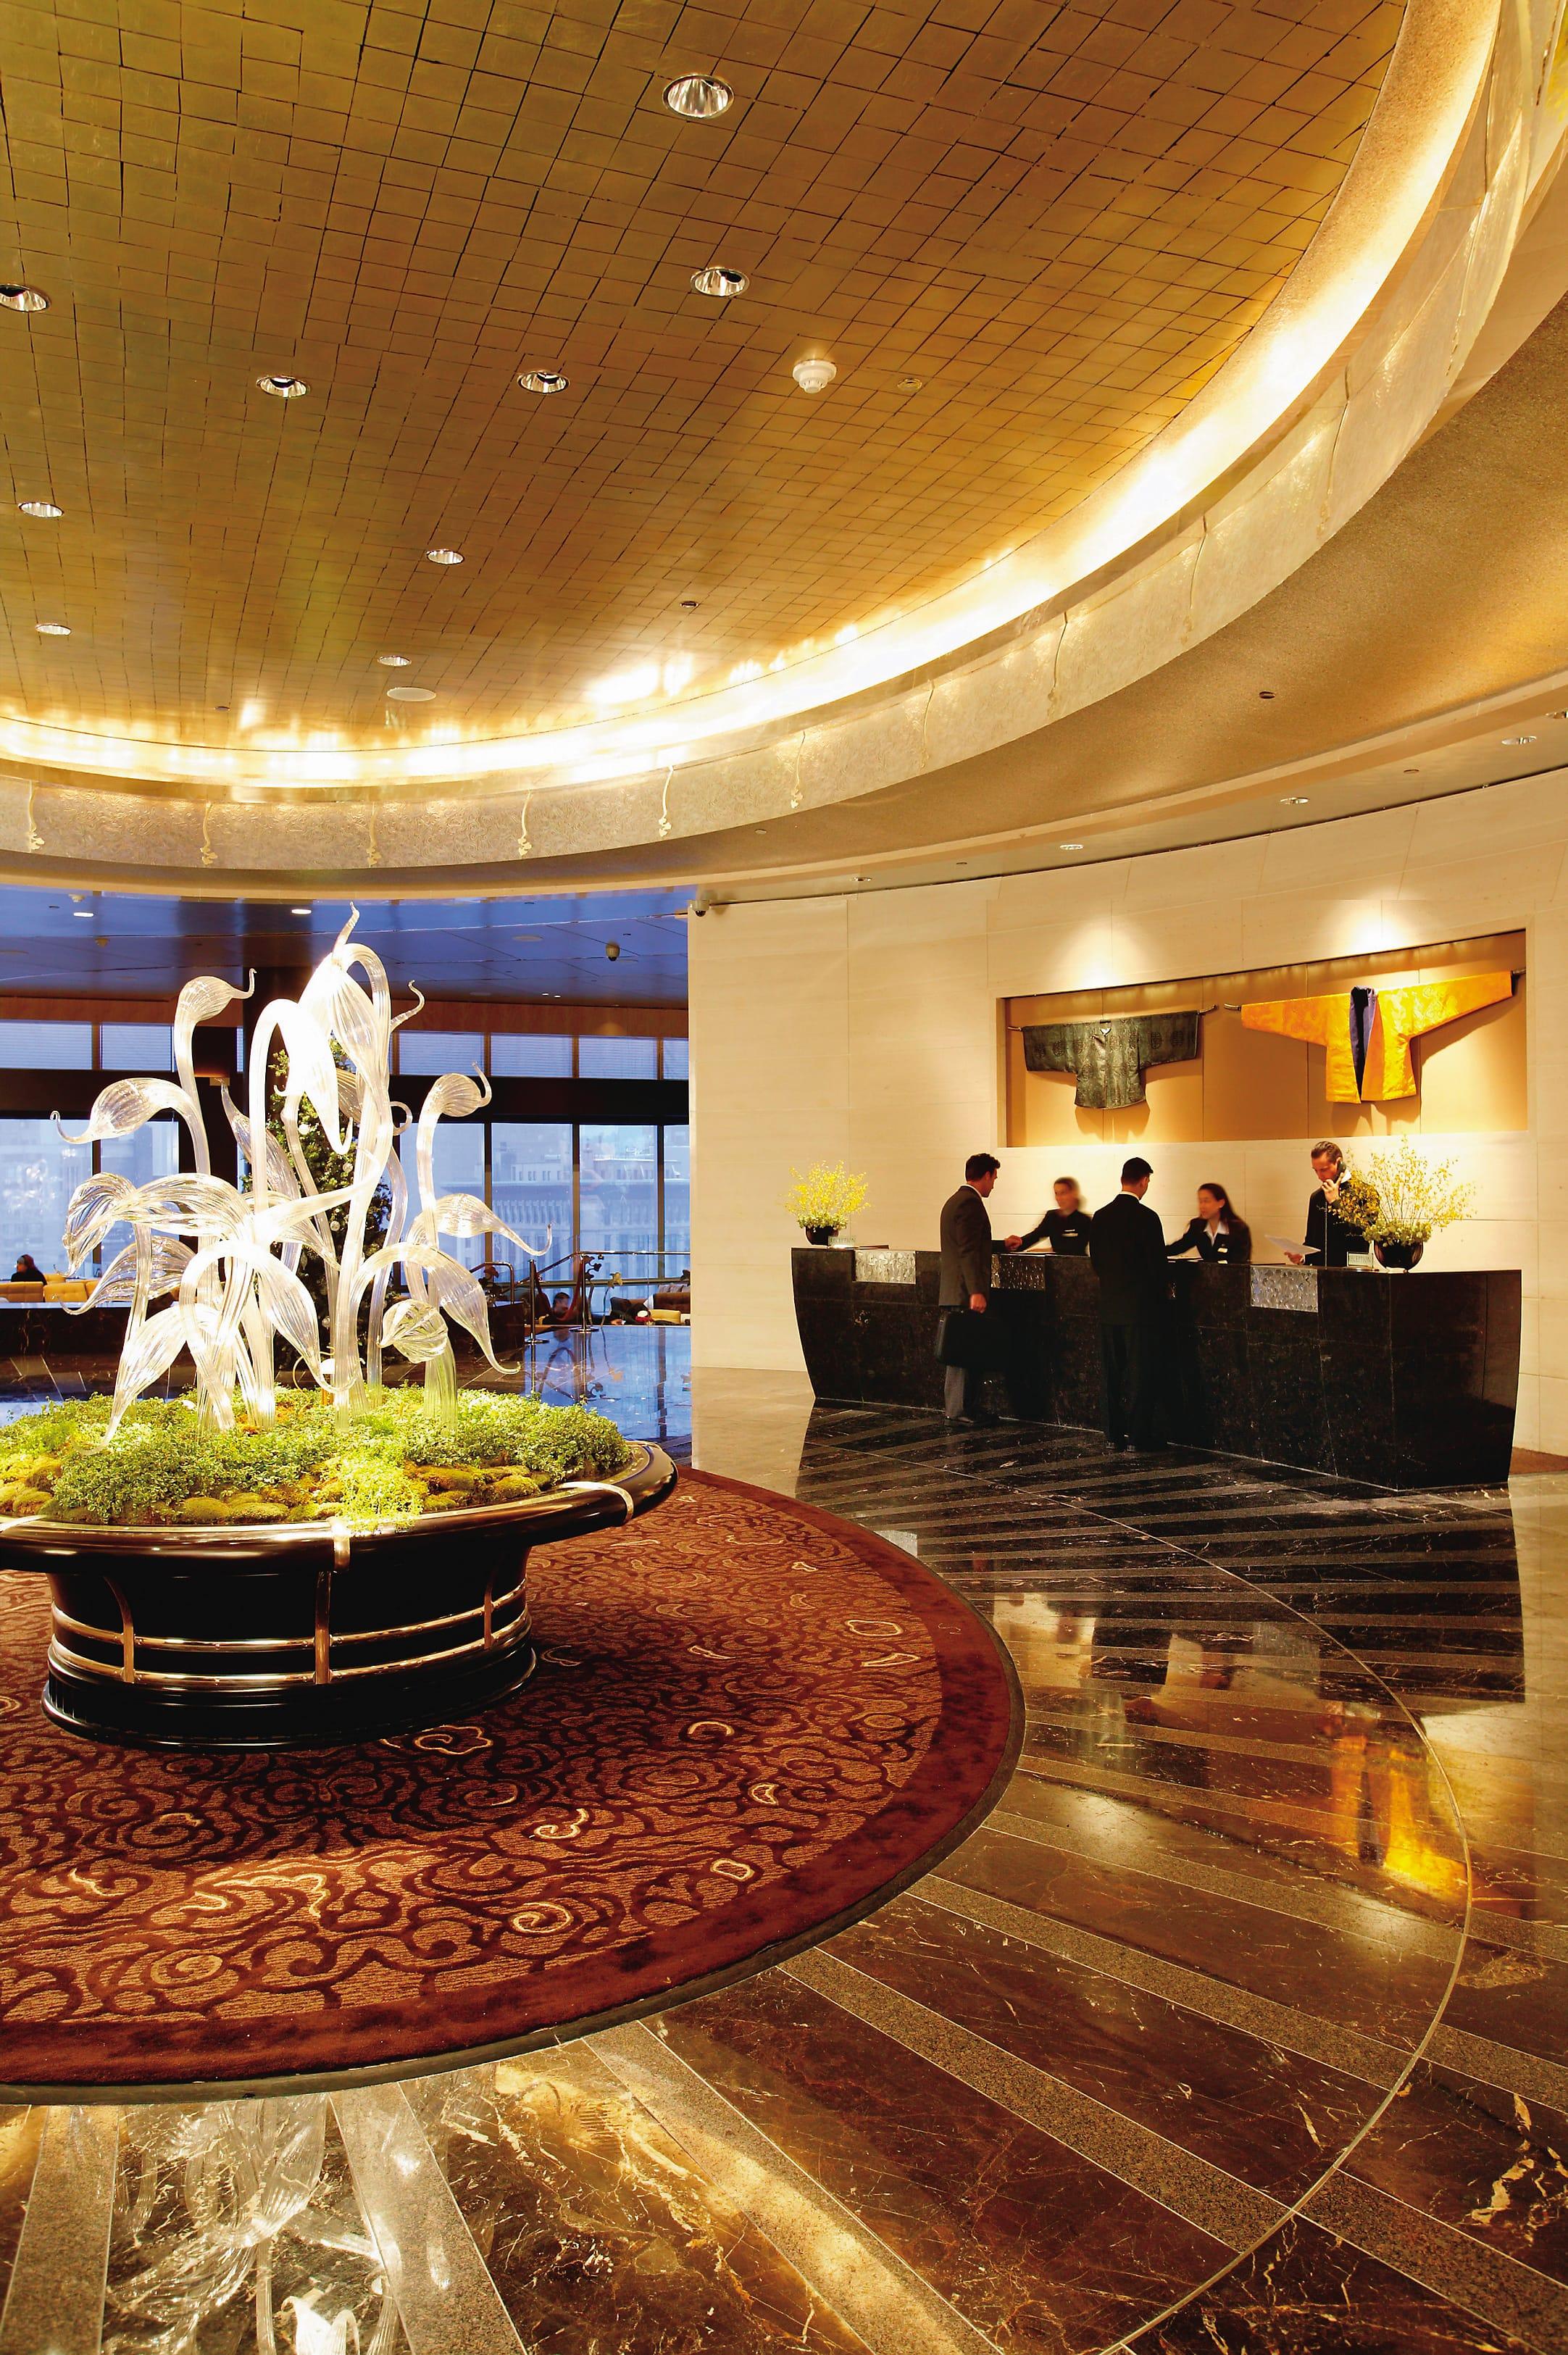 New York Hotel Photo Gallery Mandarin Oriental New York